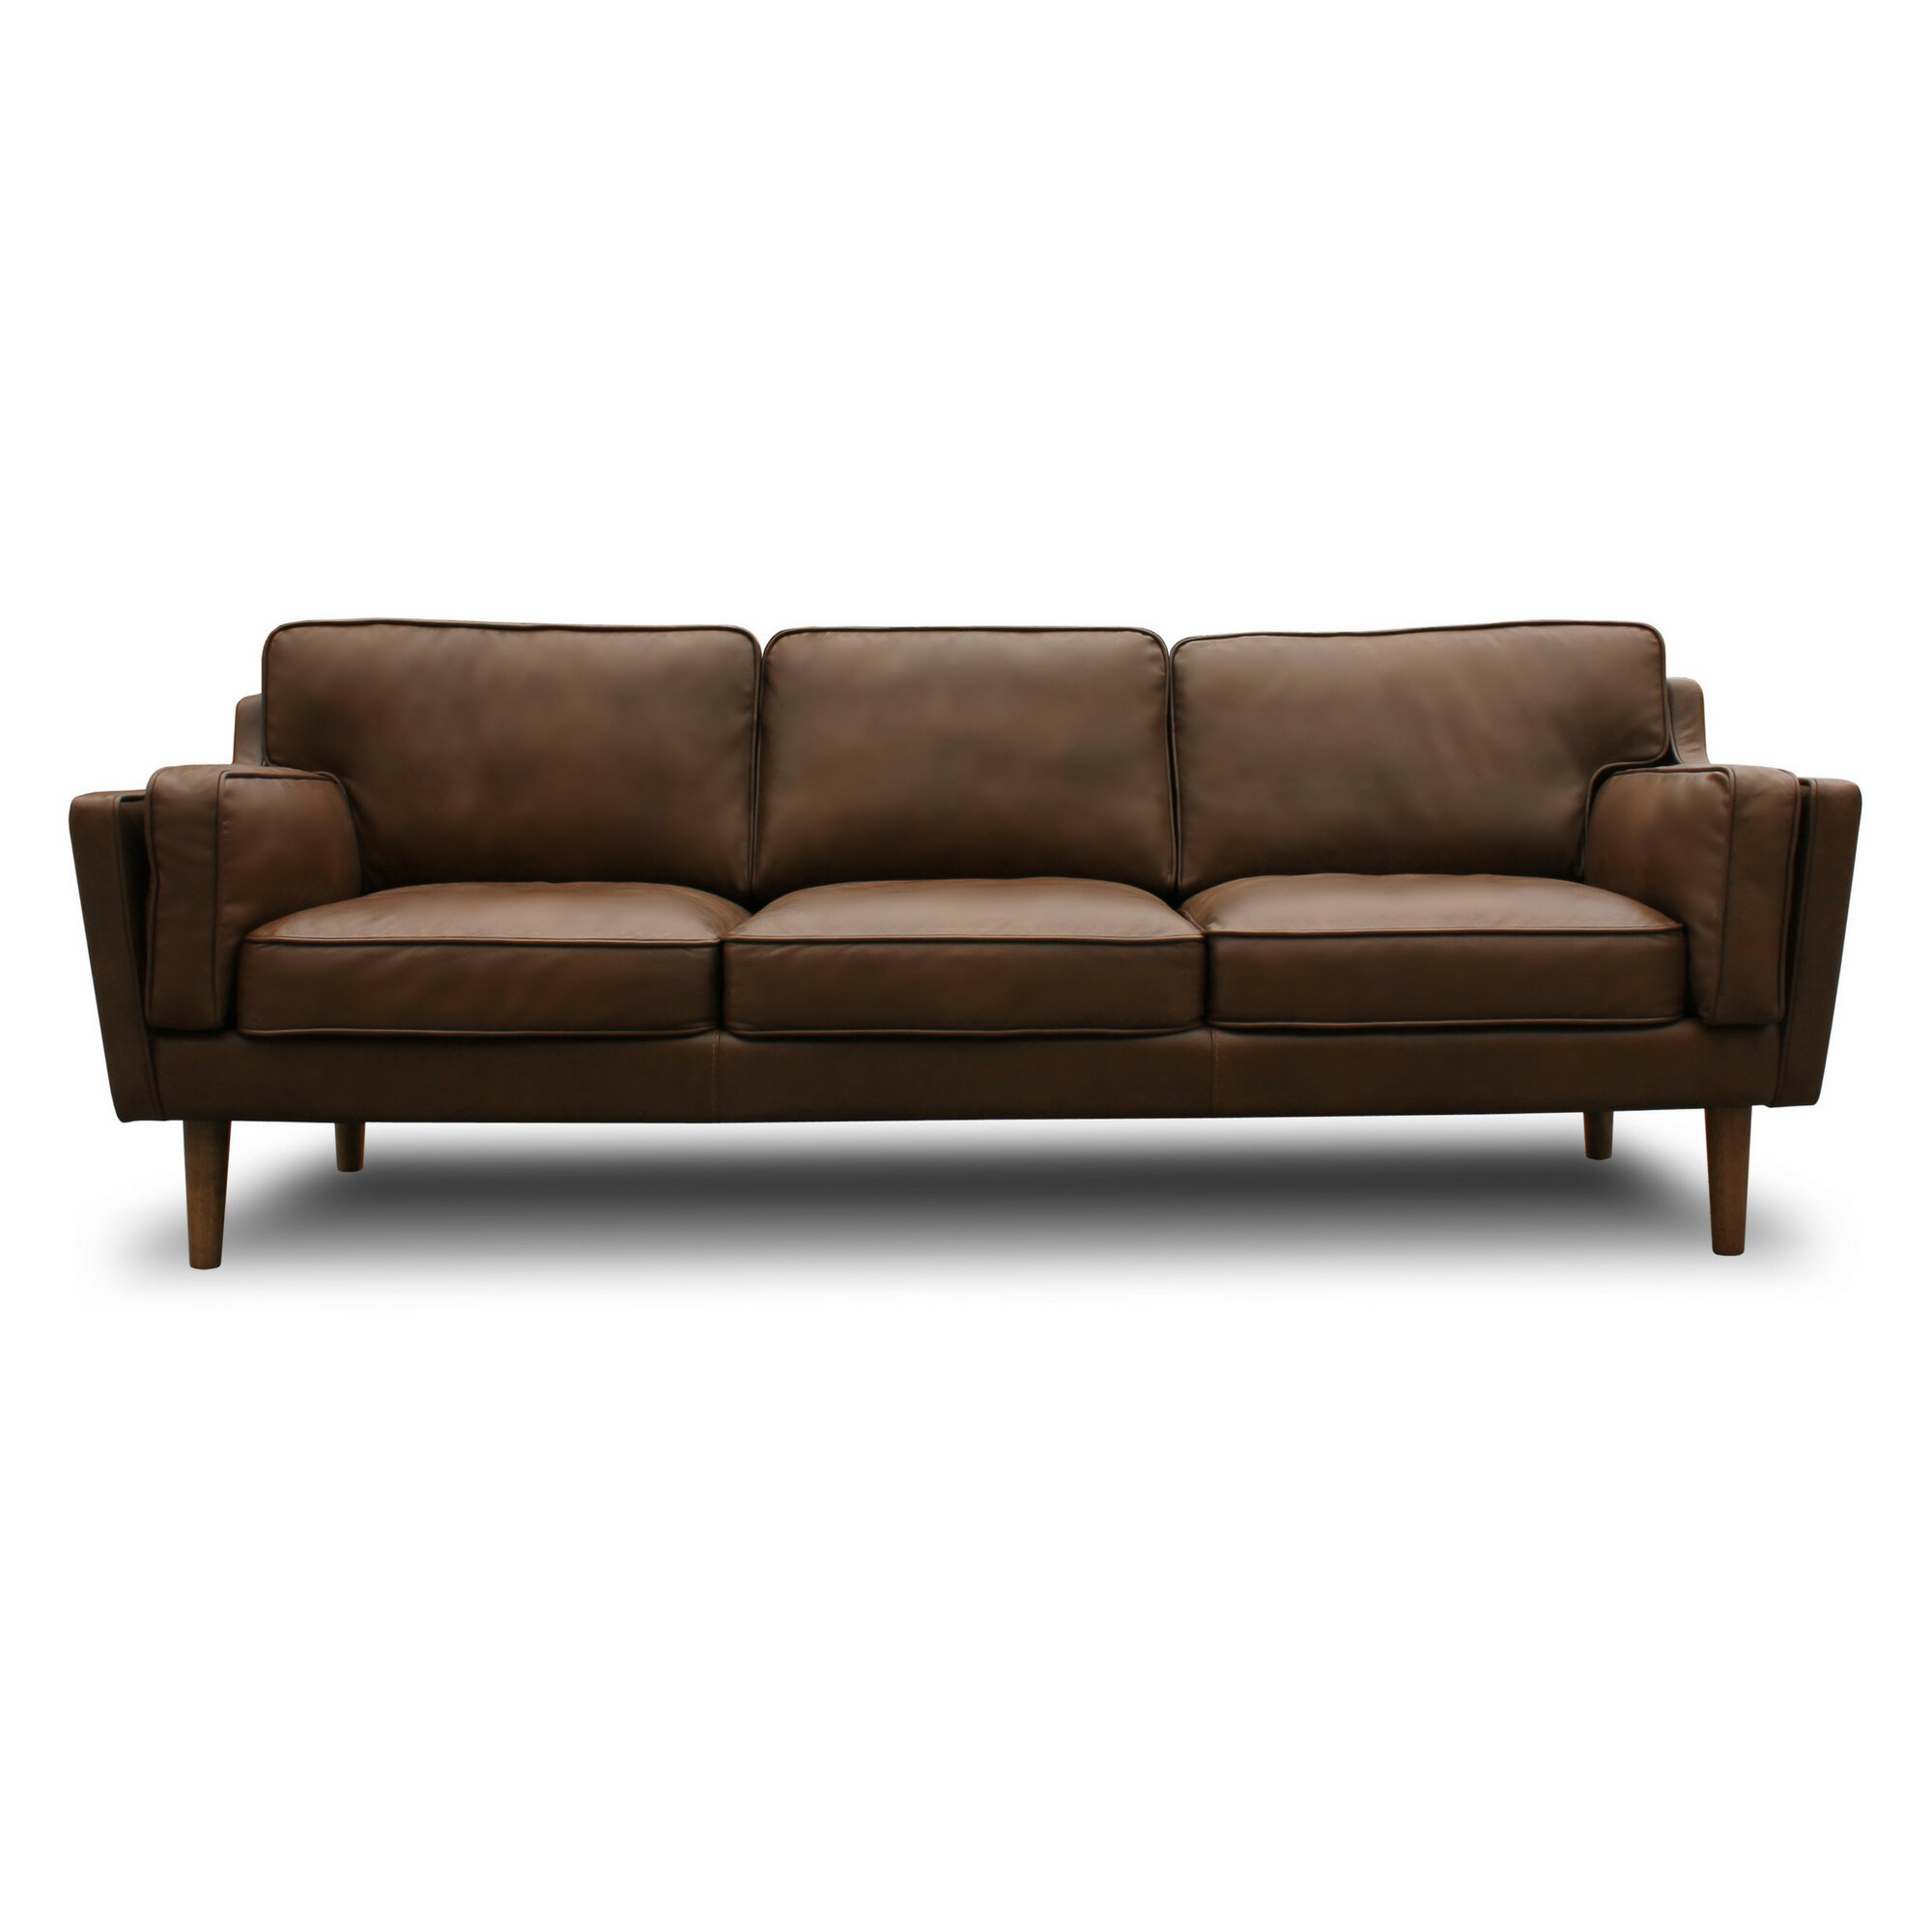 mid century modern sofa bed – aavnc-school.com